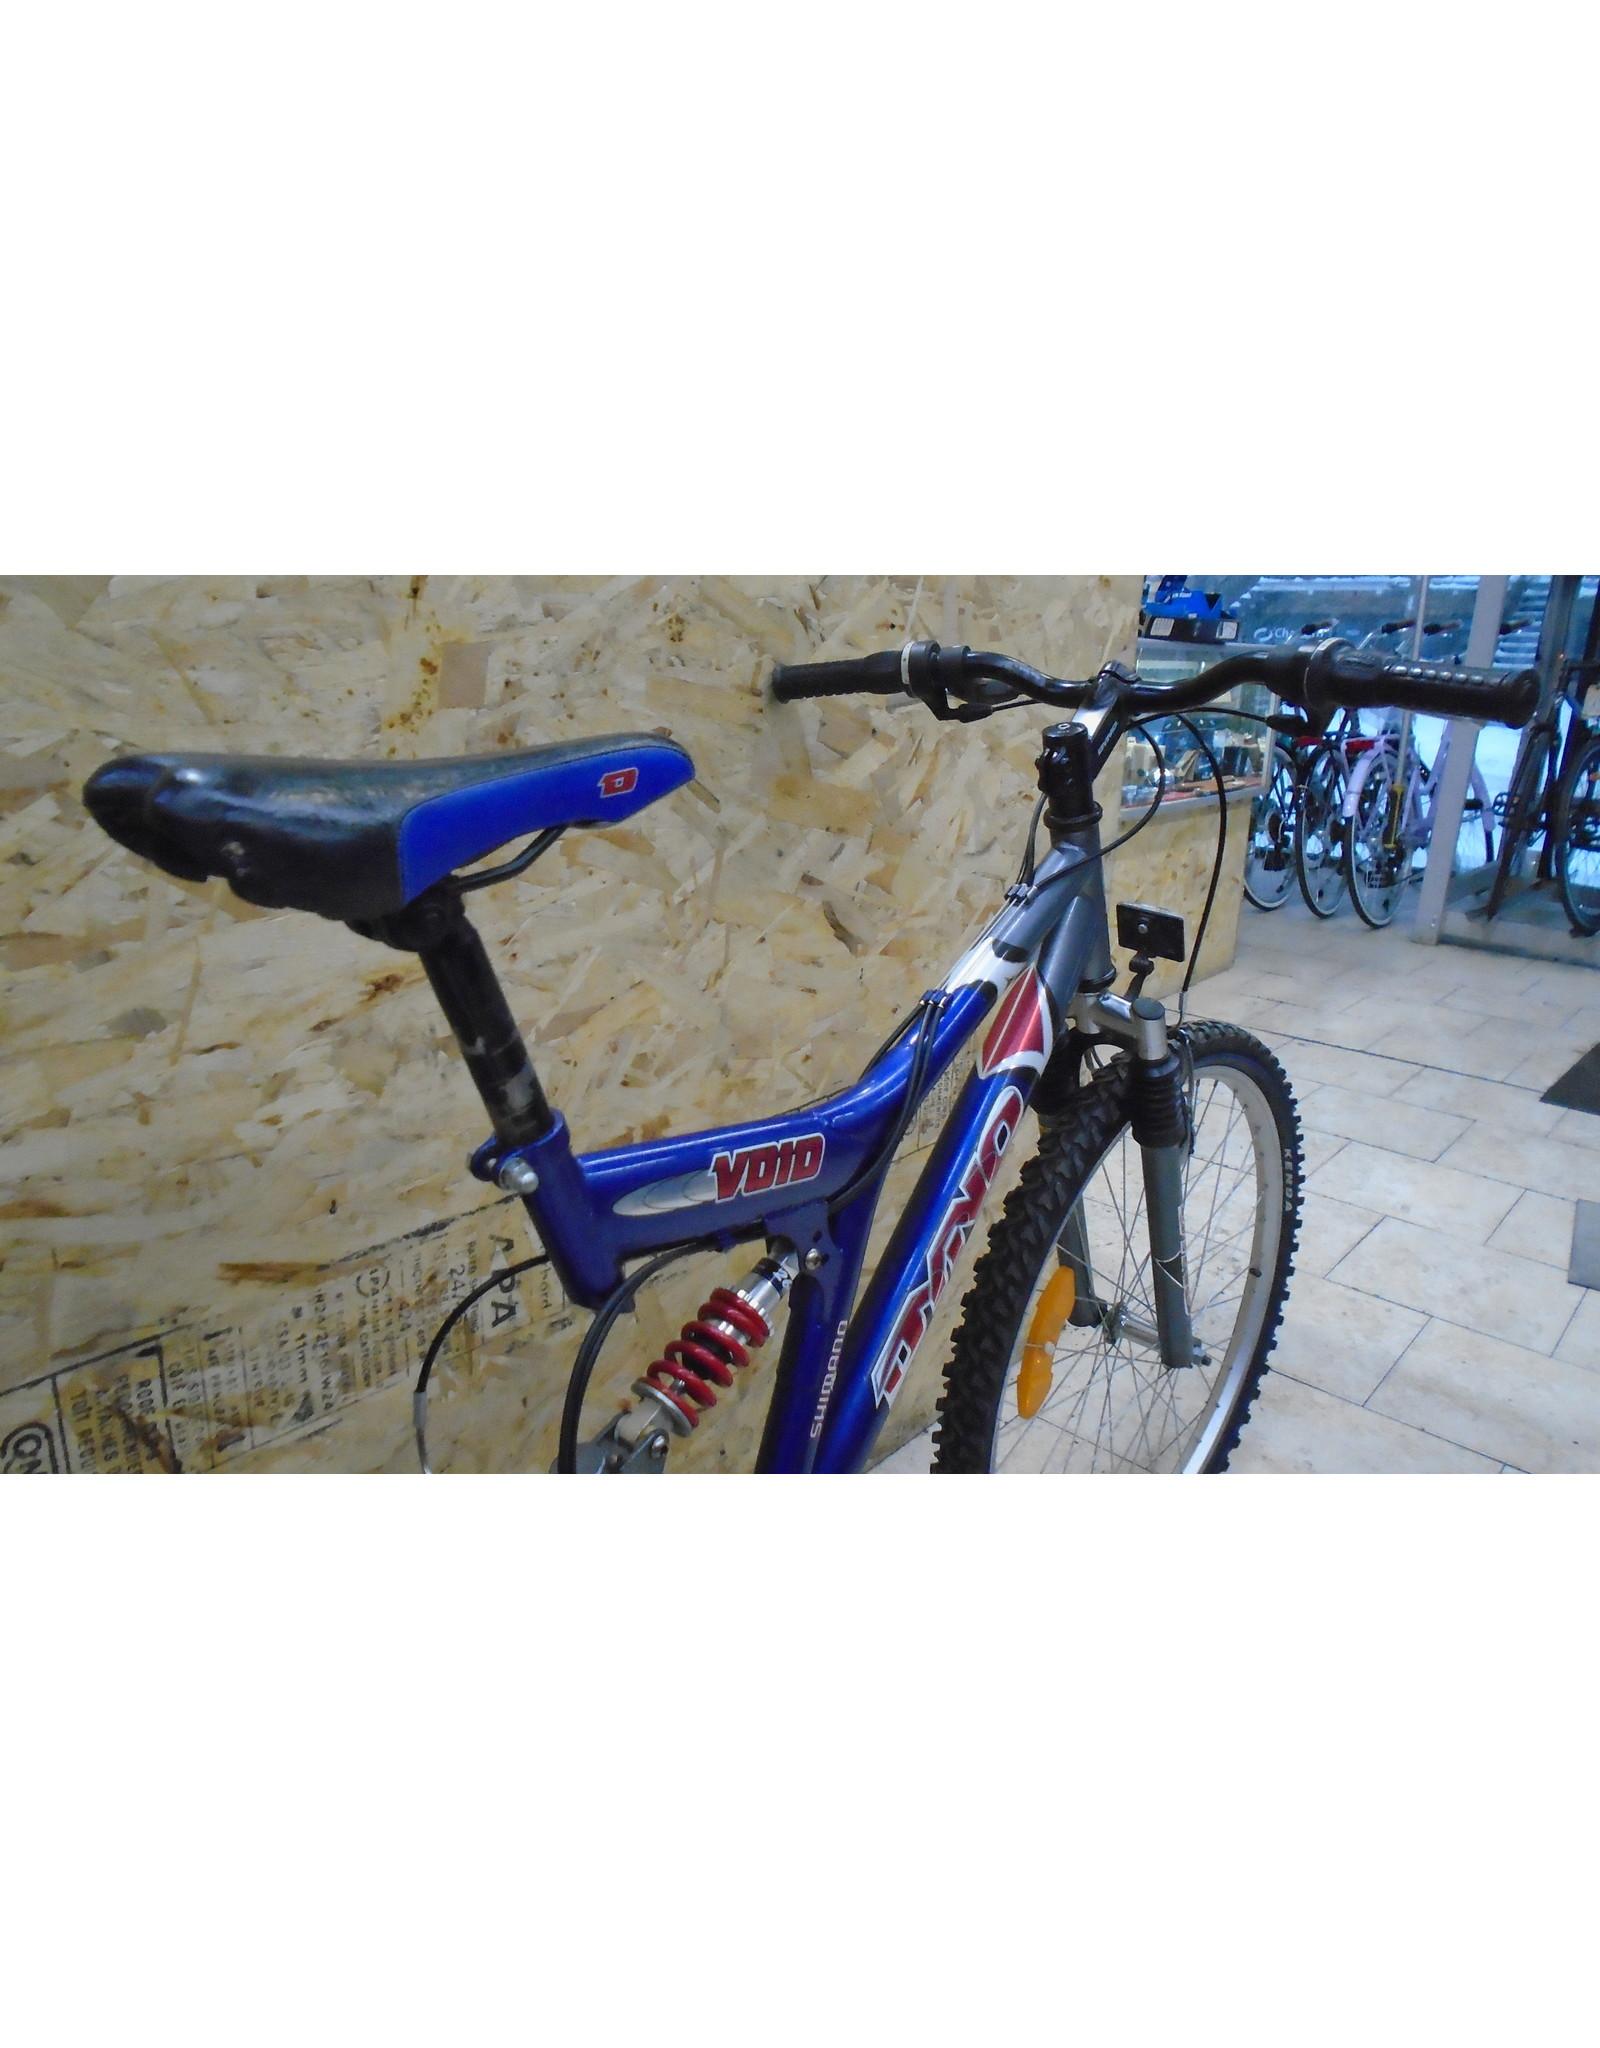 "Copy of Vélo usagé de montagne Sportek 17"" - 9806"